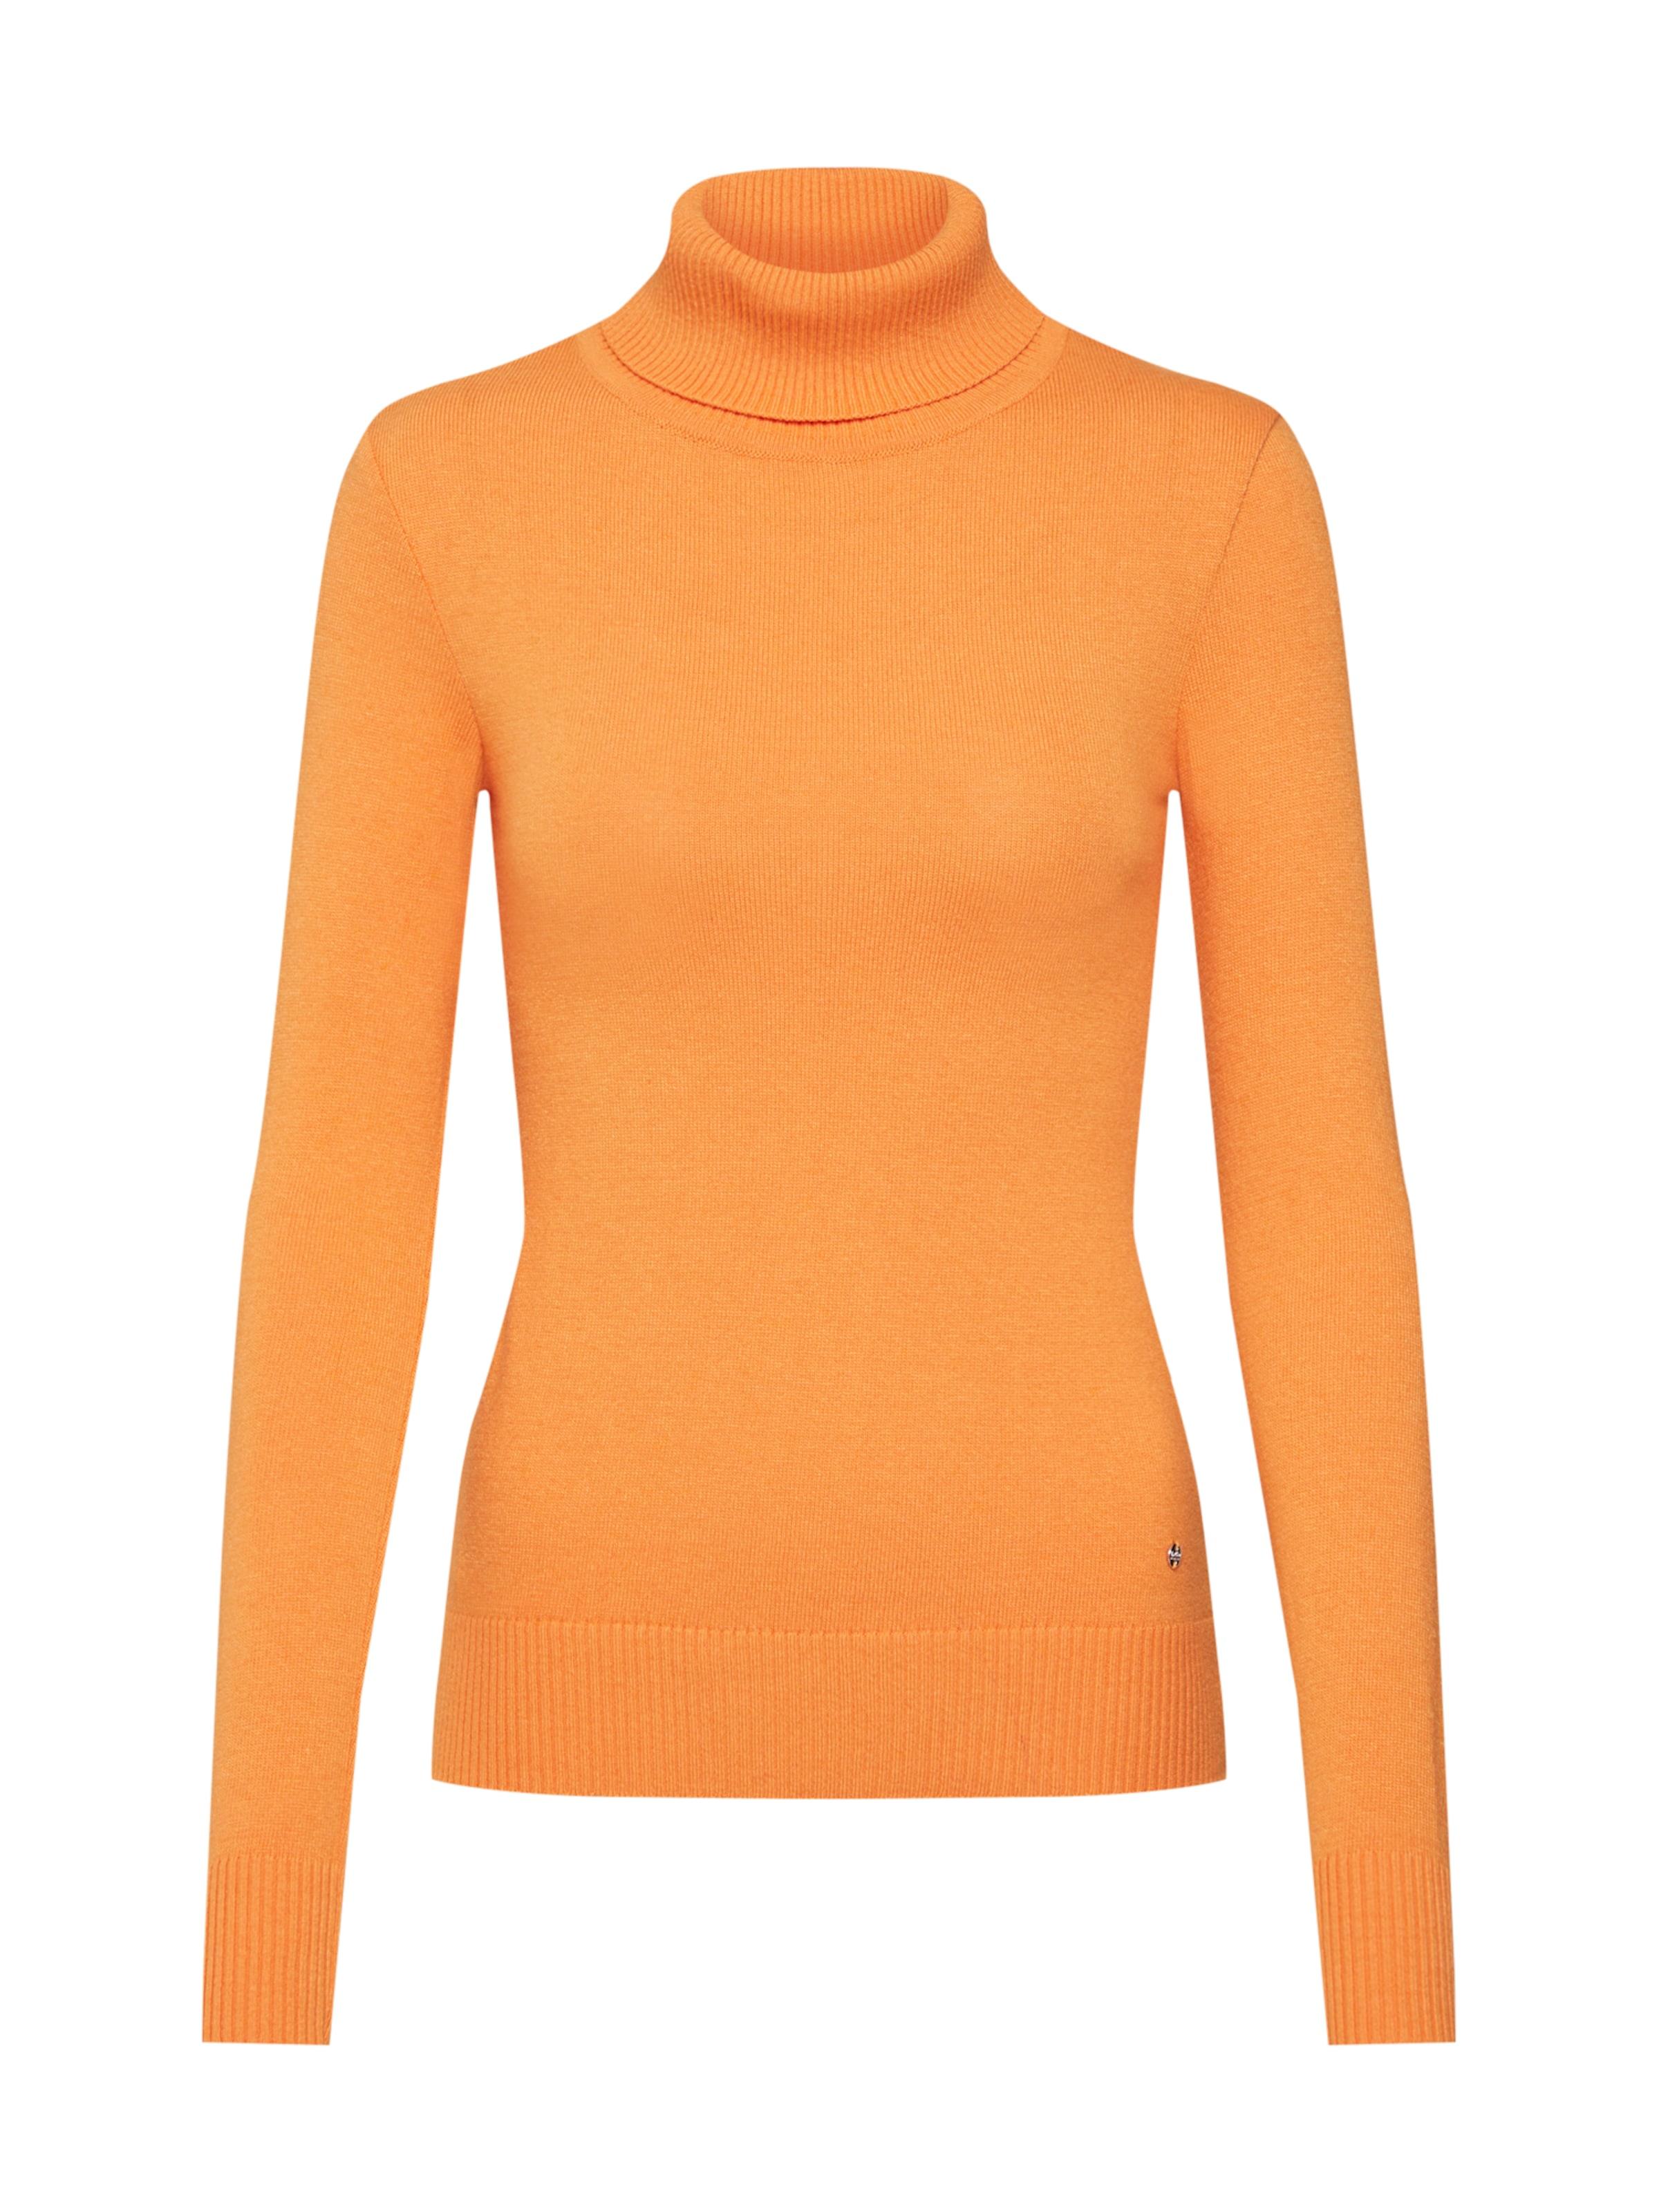 In Orange Rollkragen pullover Lena 'elin' Gercke By Leger uXiOkZP